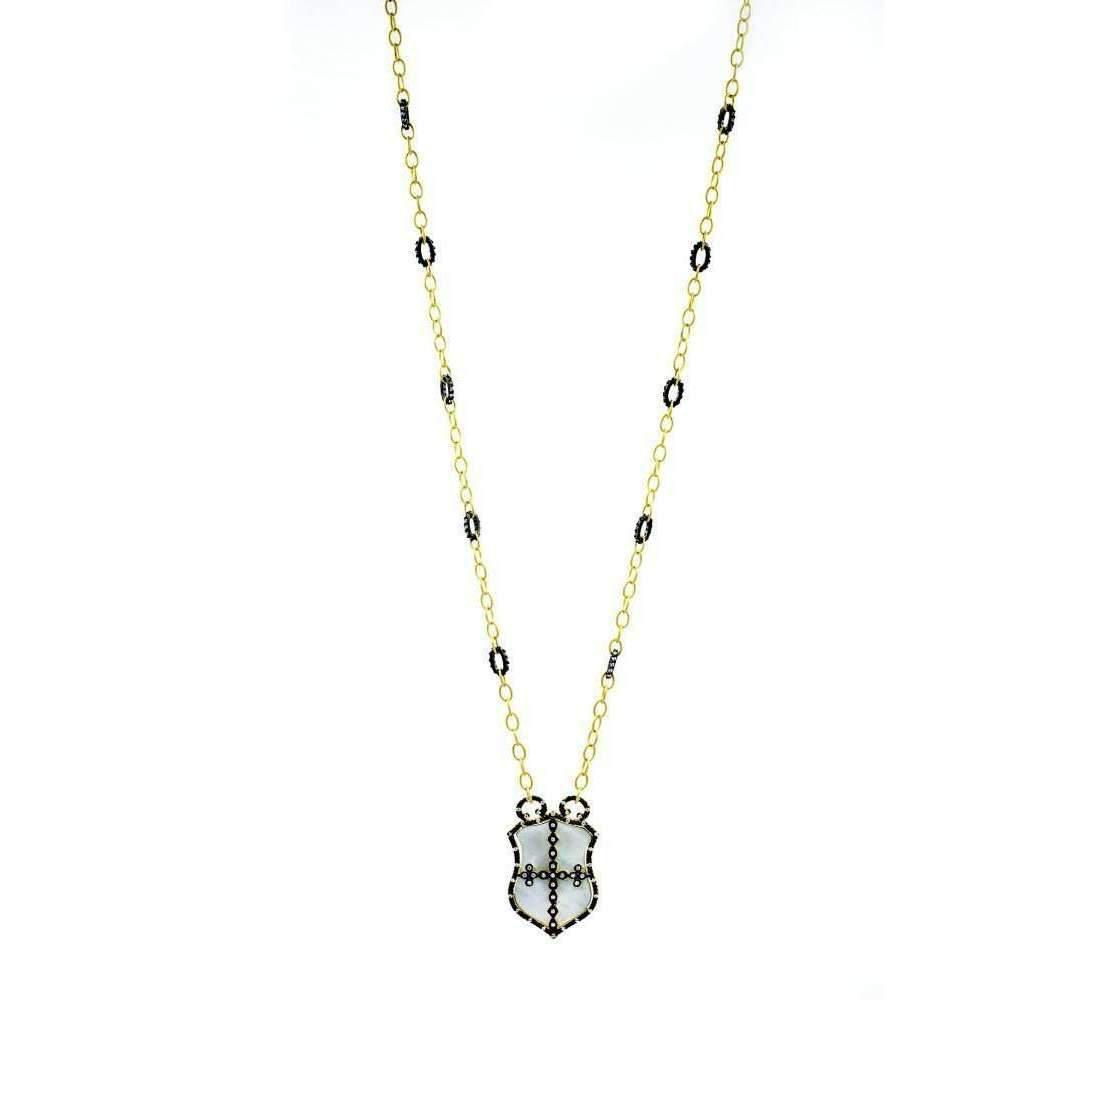 Freida Rothman Metropolitan Shield Necklace QalOX6ib2